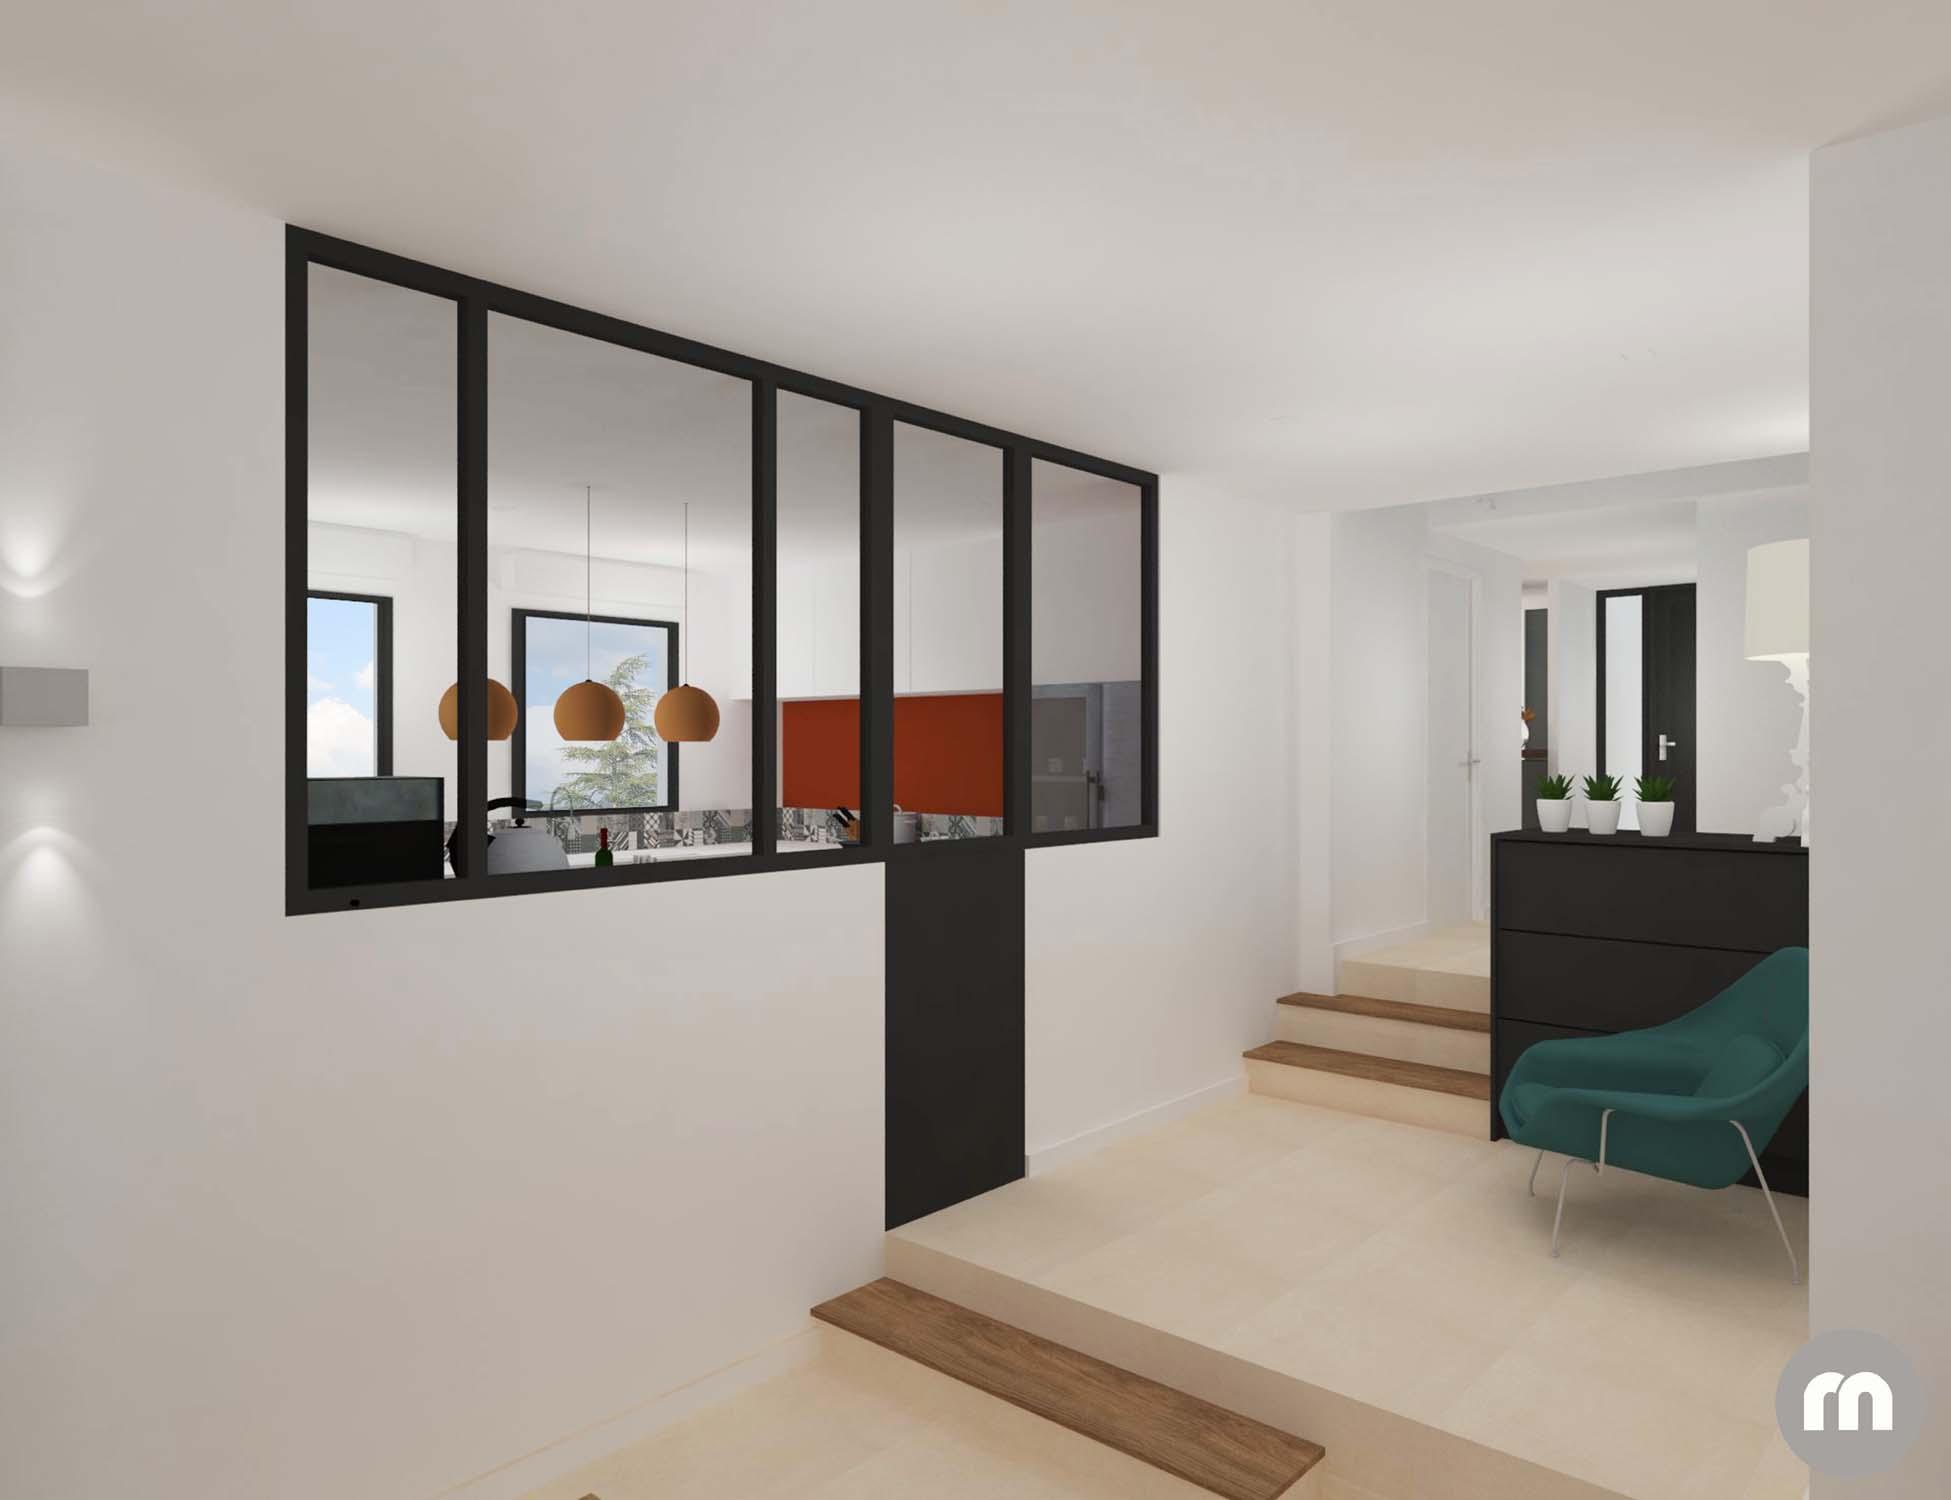 Maison Solaize Marlene Reynard Verriere Atelier 3d Marl Ne Reynard